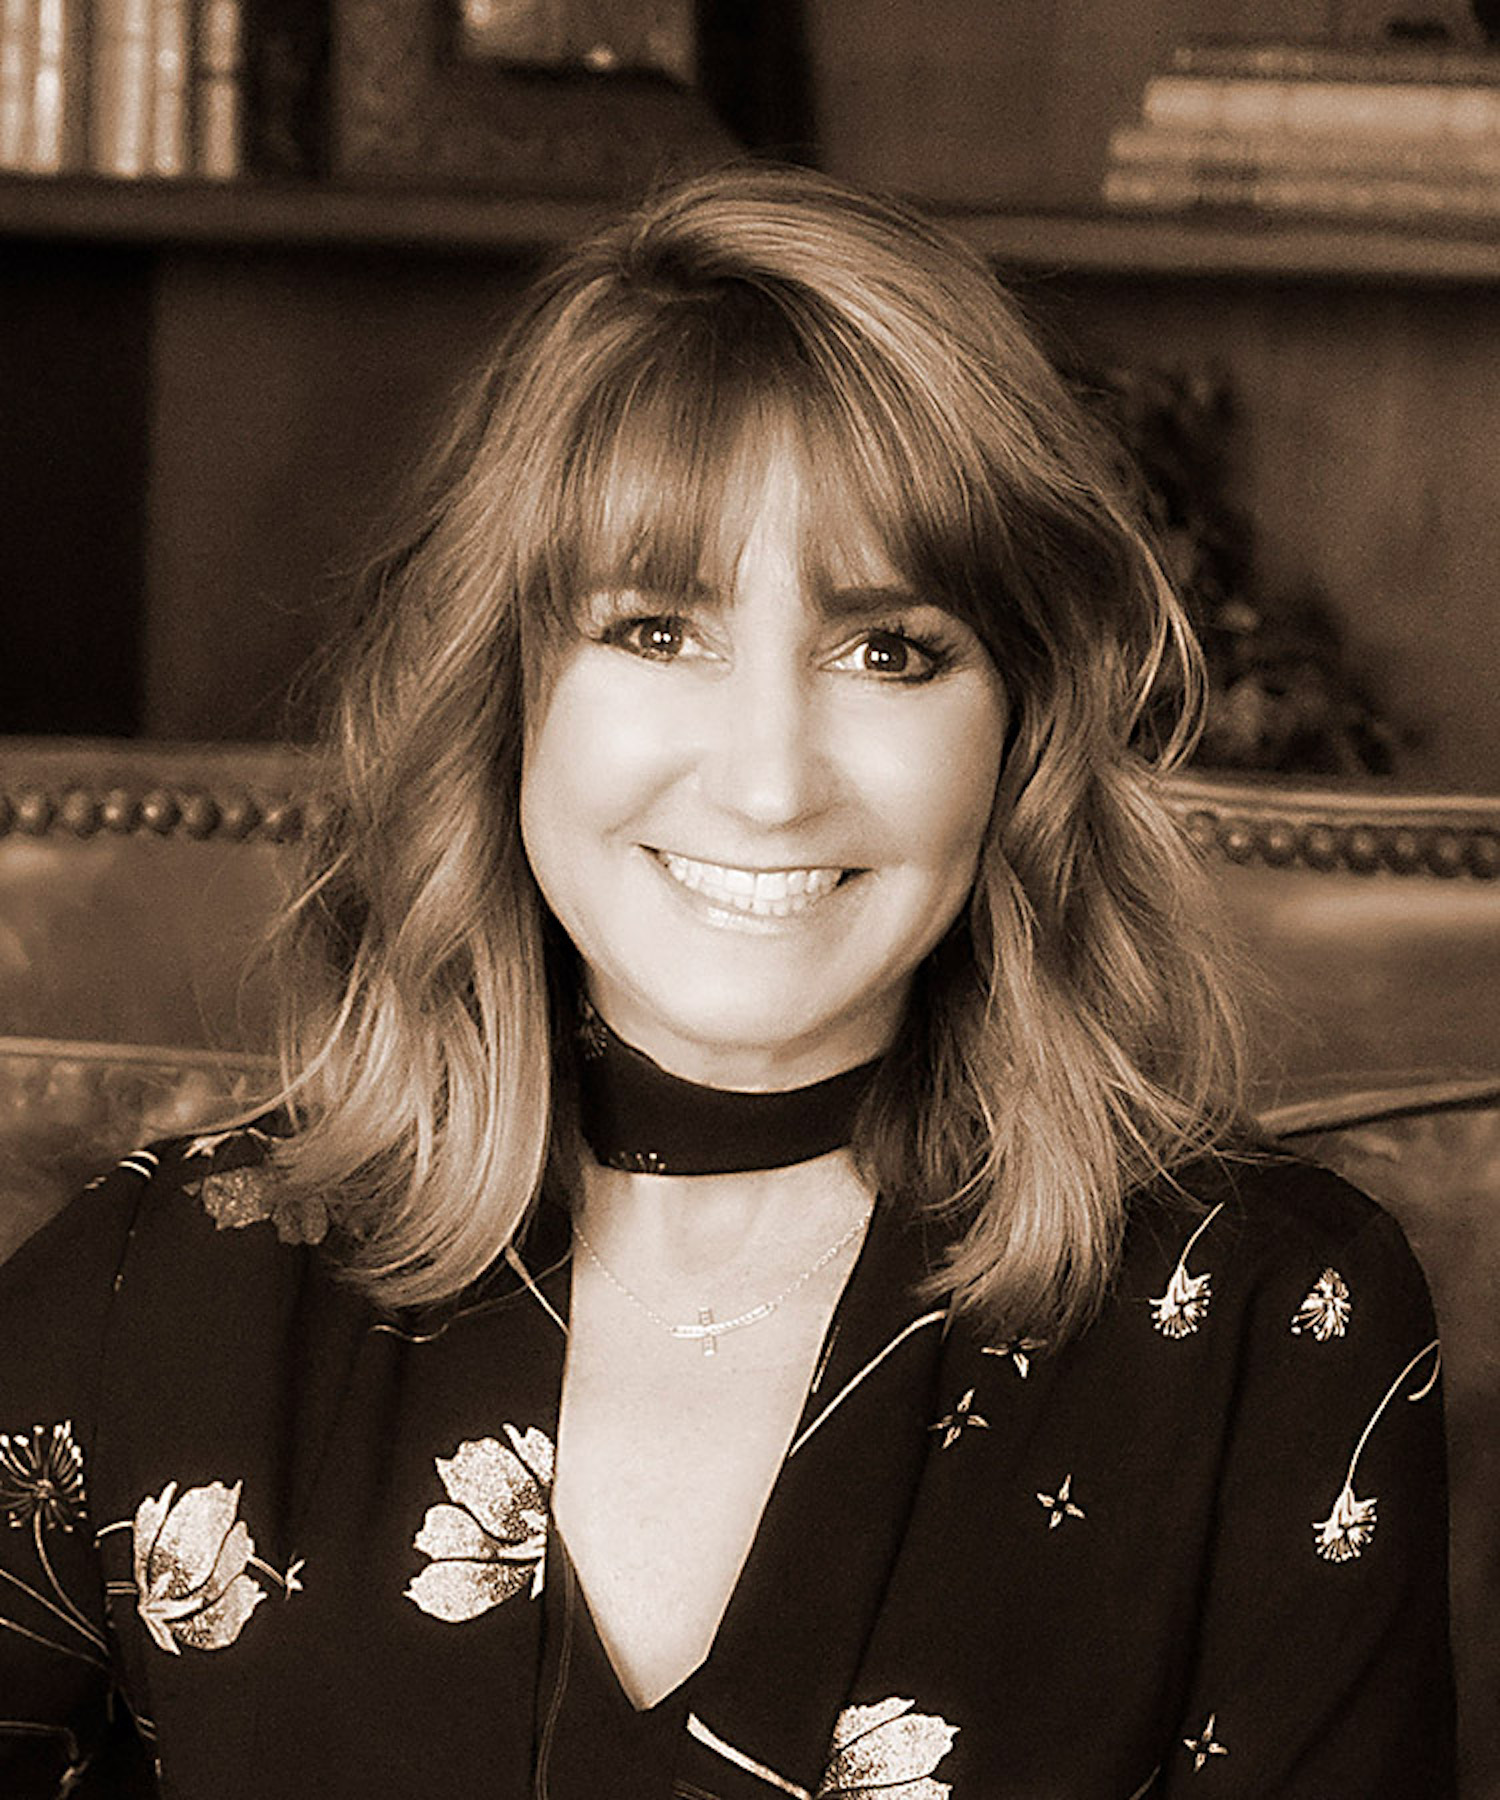 Kimberly Kreissig